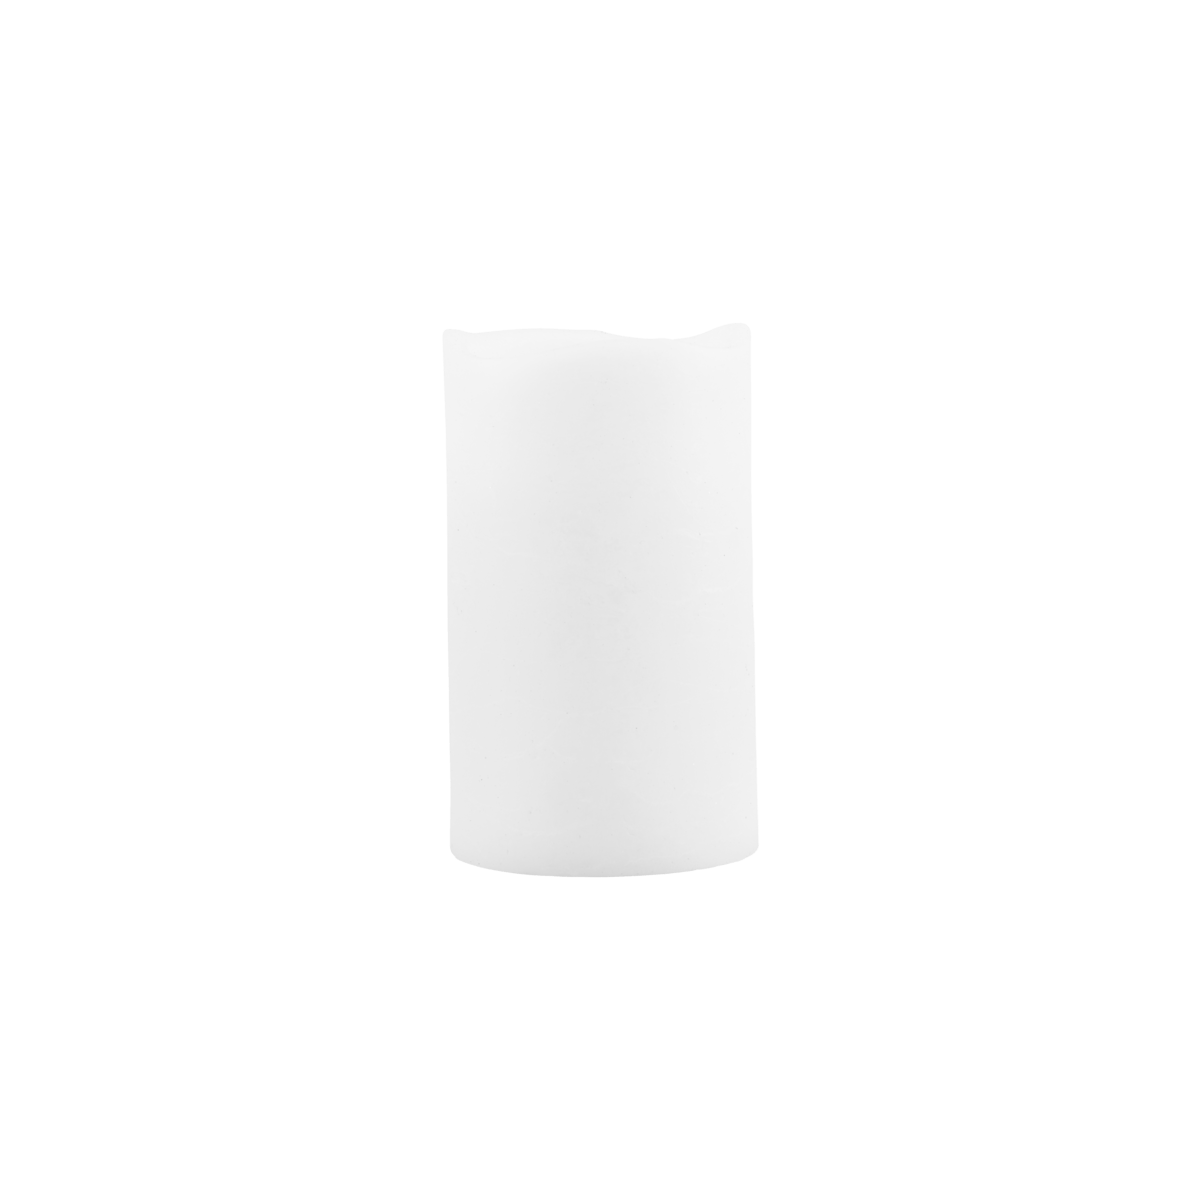 Sada 6 ks − Svíčka LED